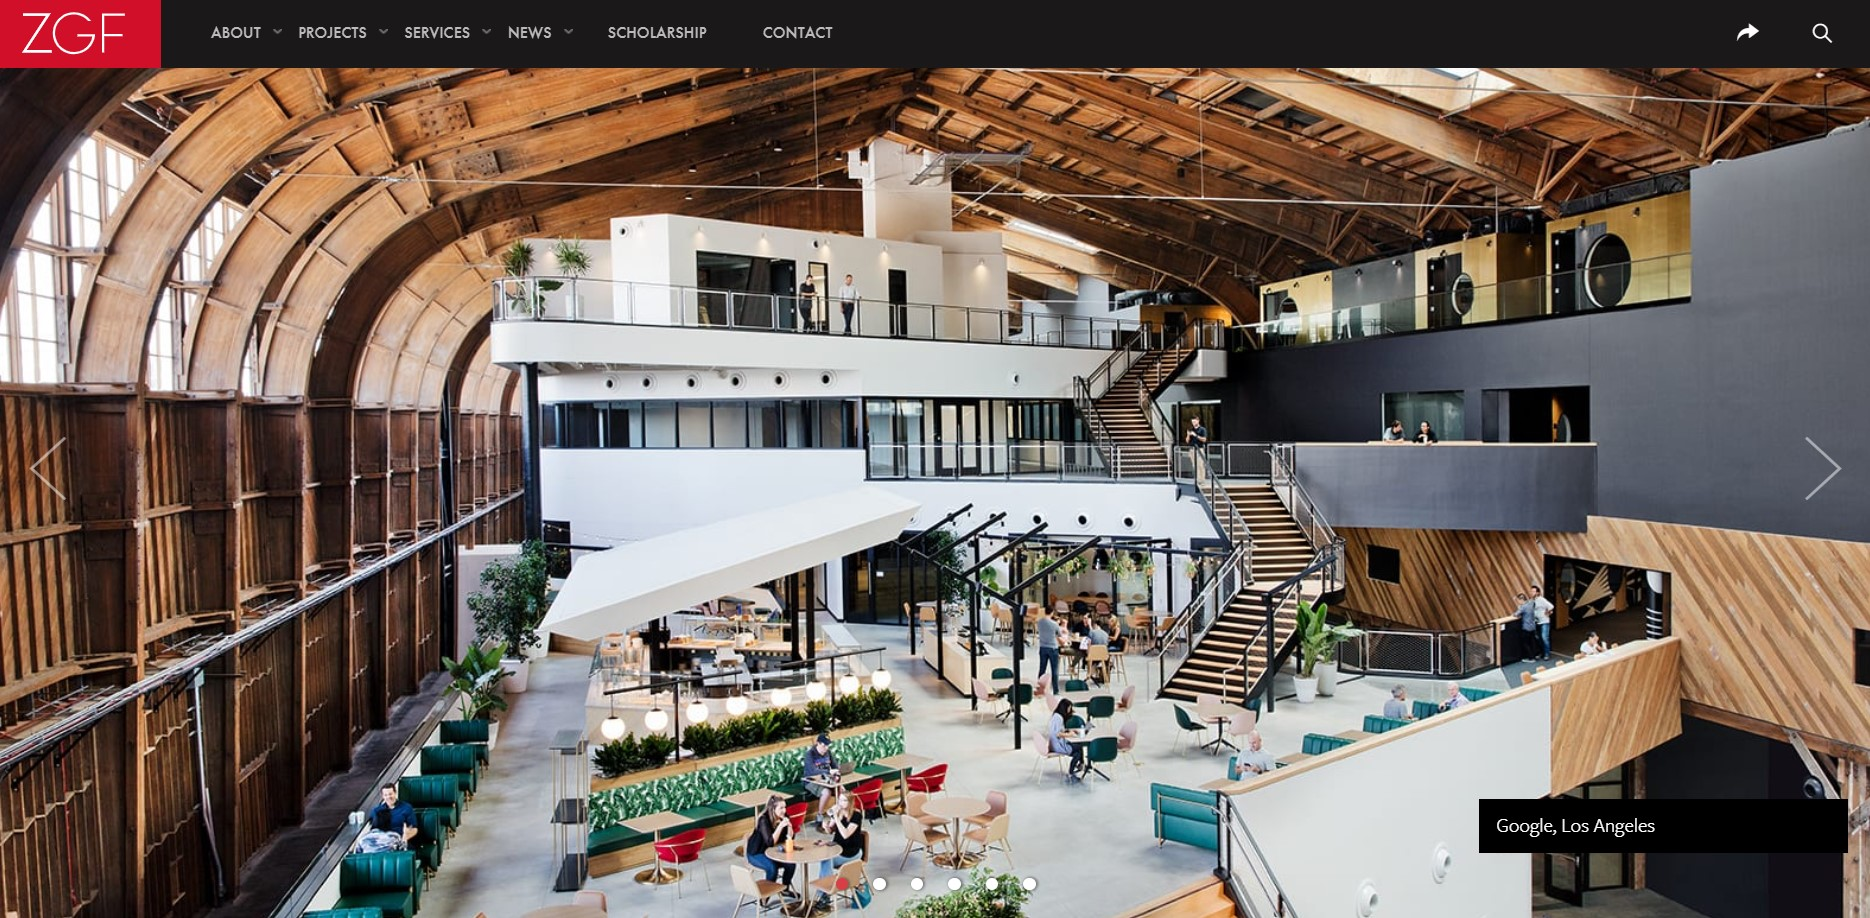 zgf architect in new york